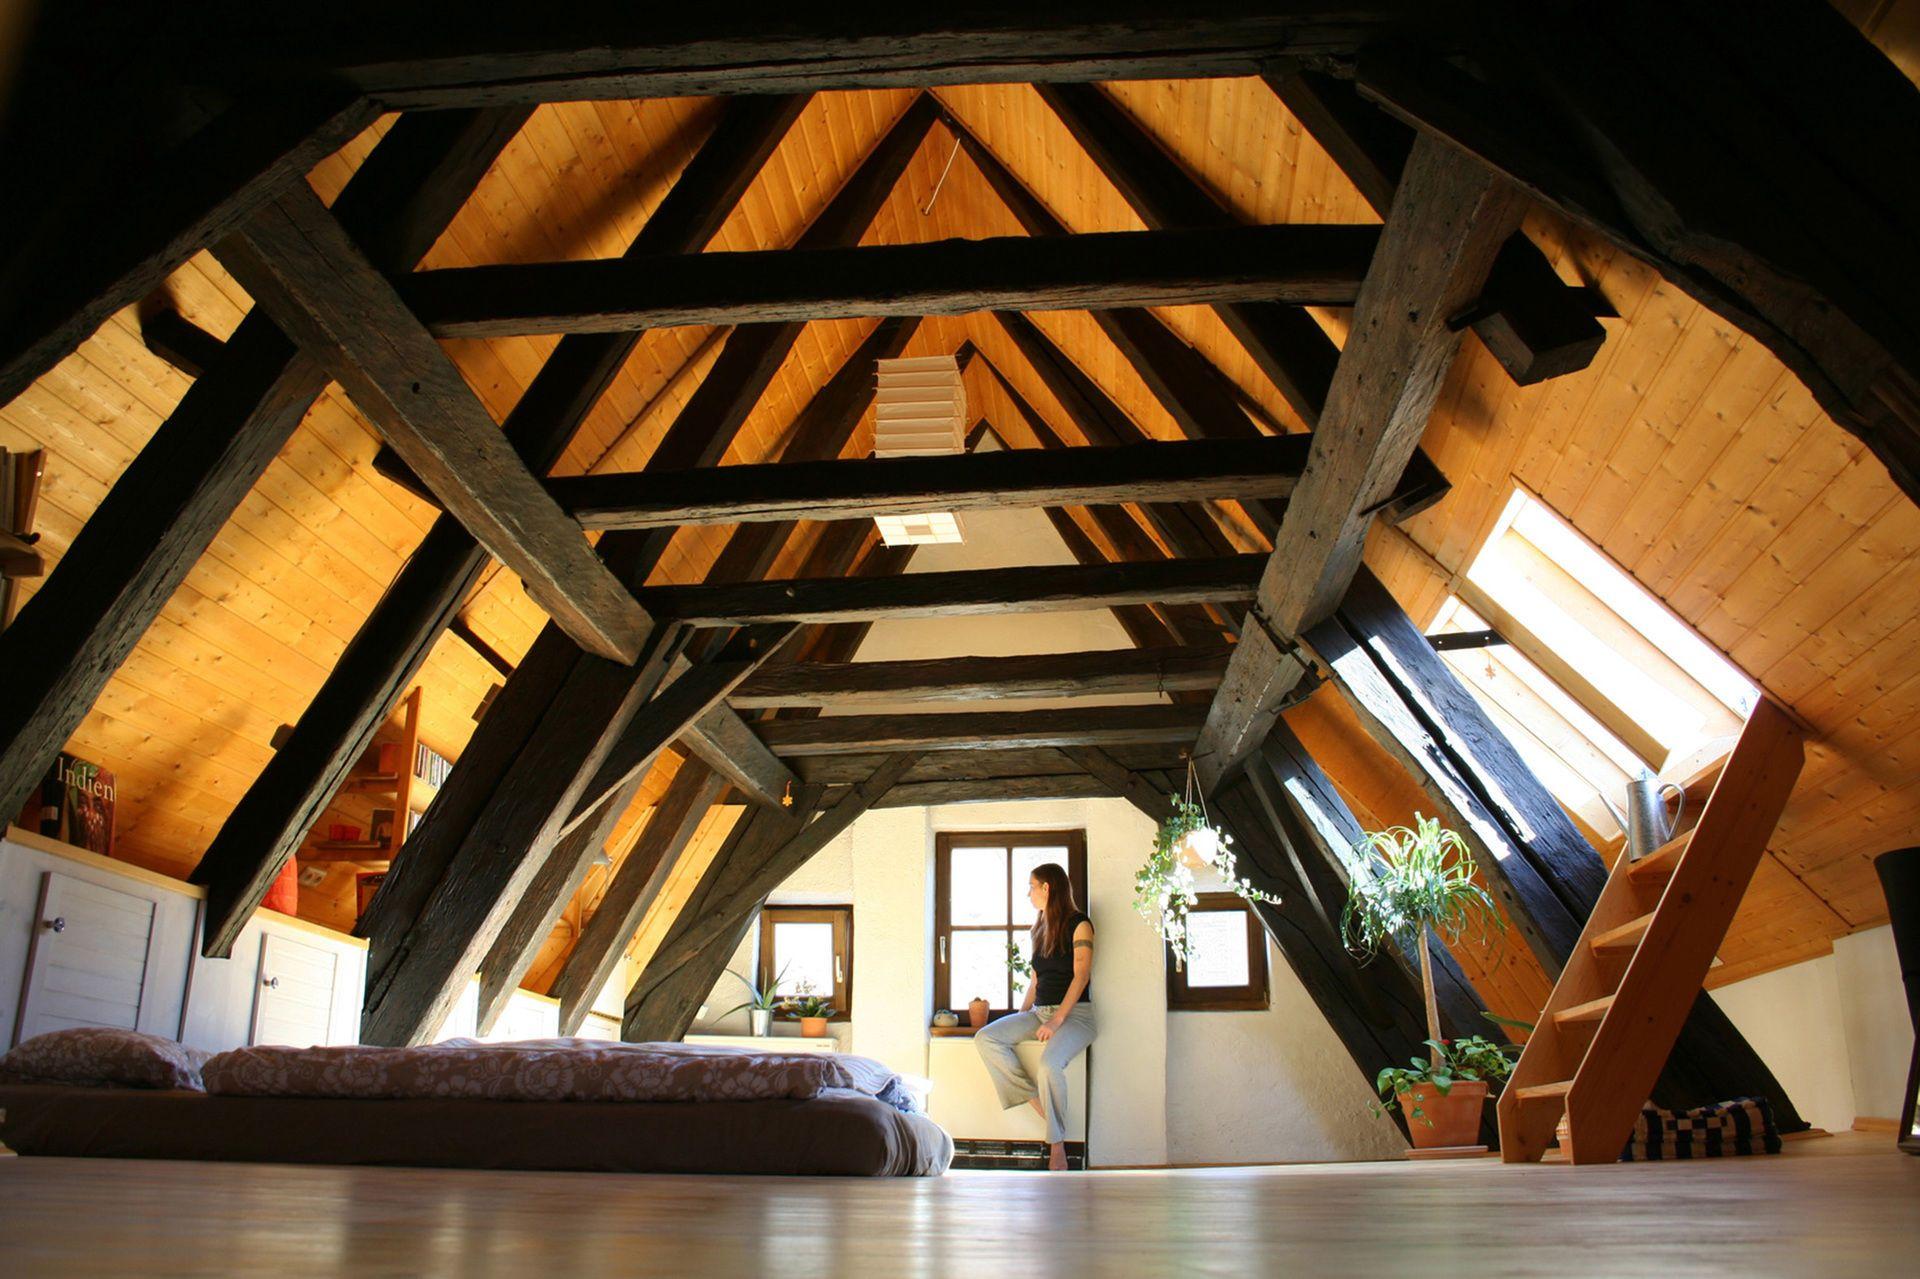 Dachausbau Viel Wohnraum Unter Dem Dach Bauemotion De